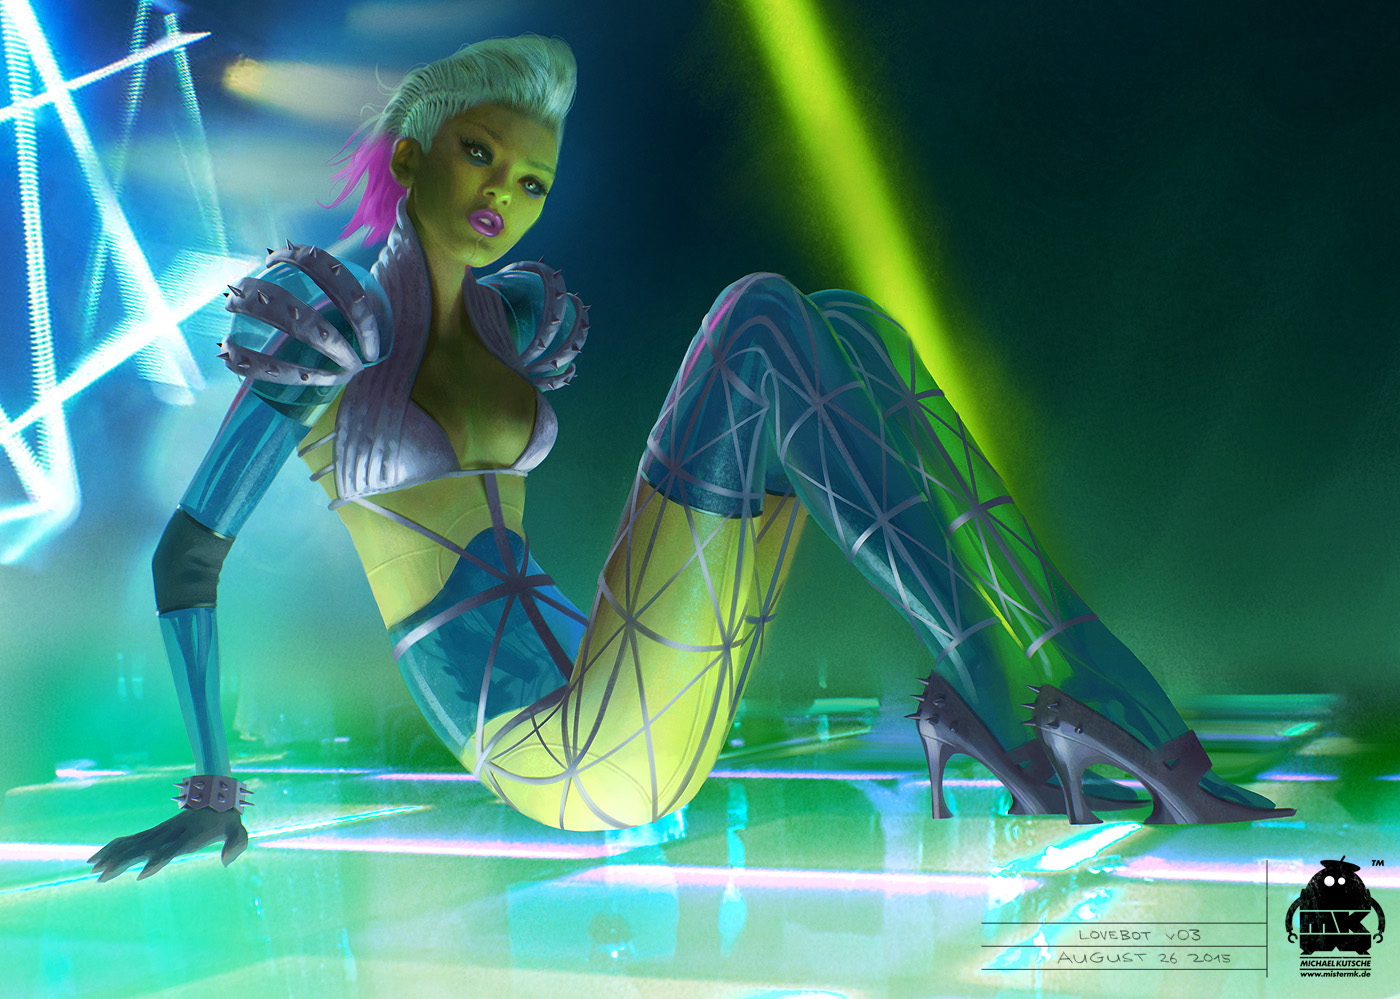 Guardians of the Galaxy Vol. 2: Lovebot Concept by michaelkutsche